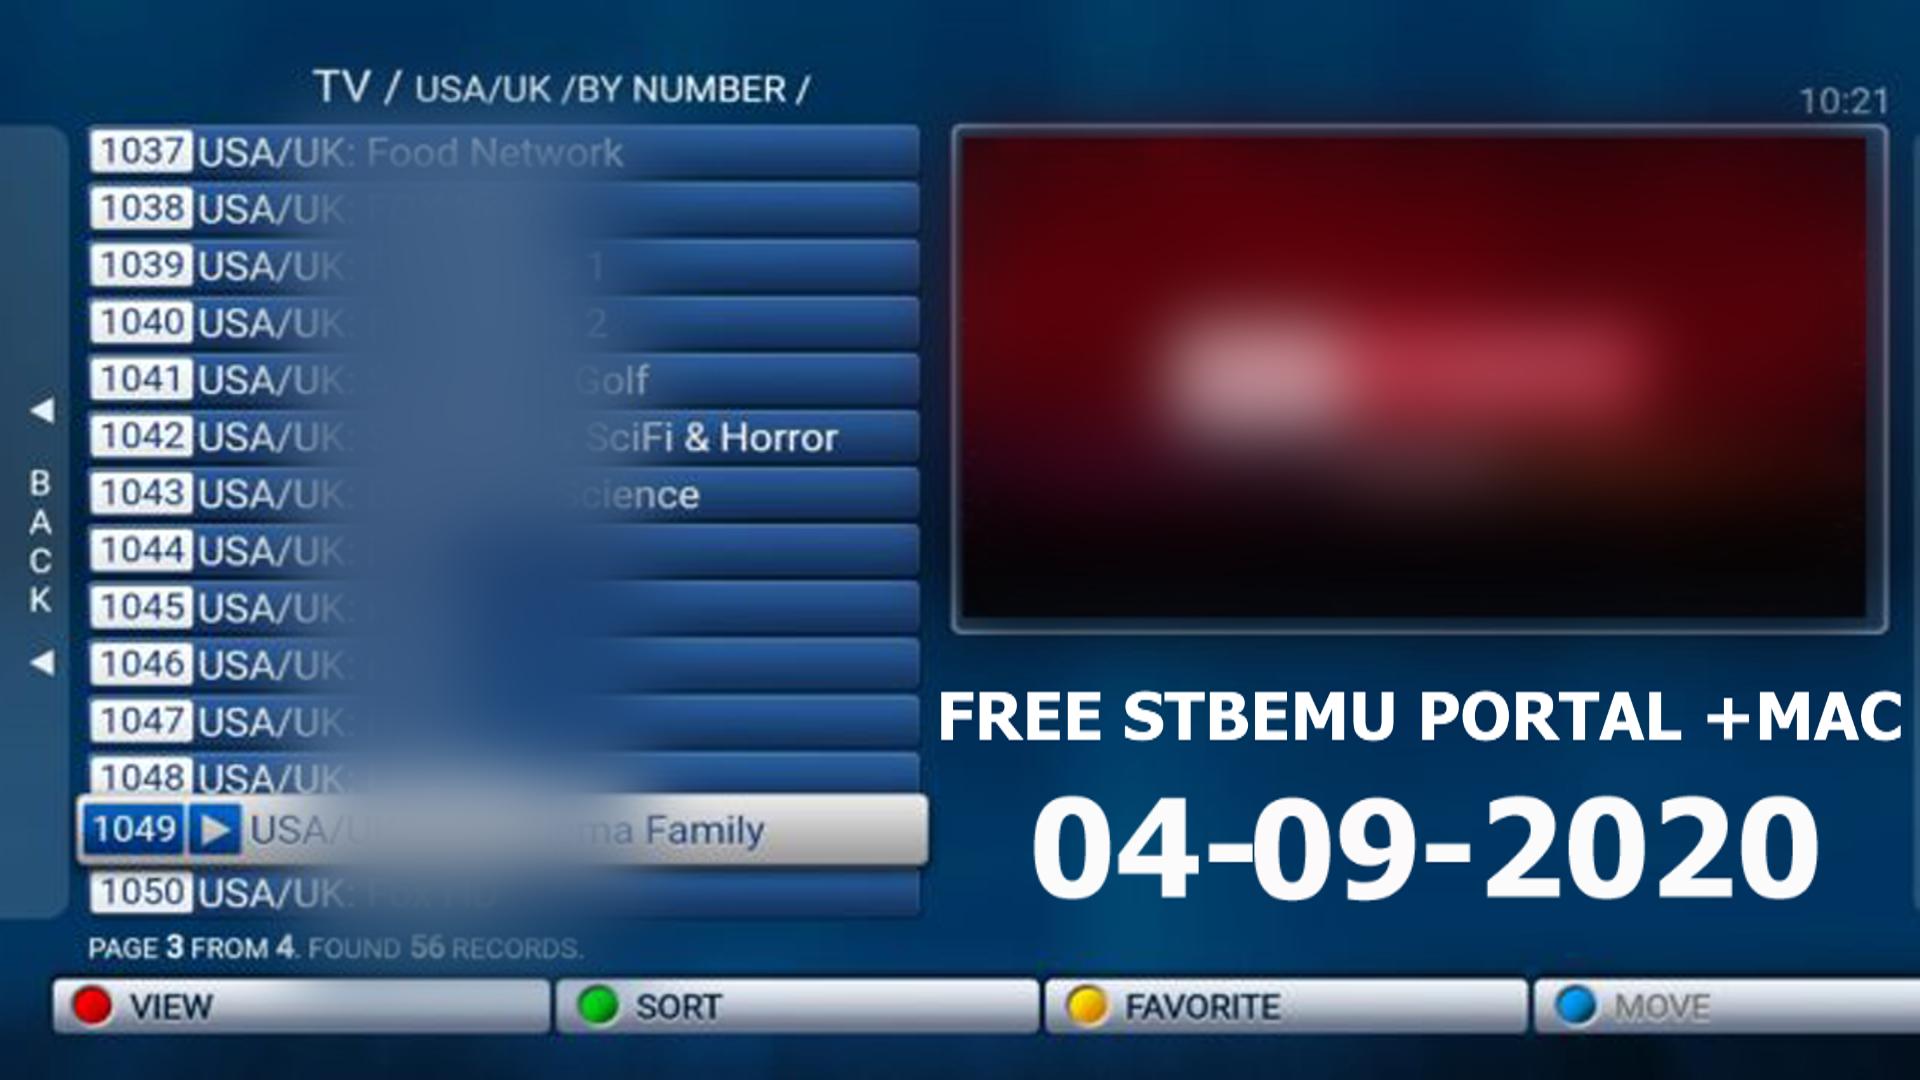 Pin On Stb Emu Free Portal Mac